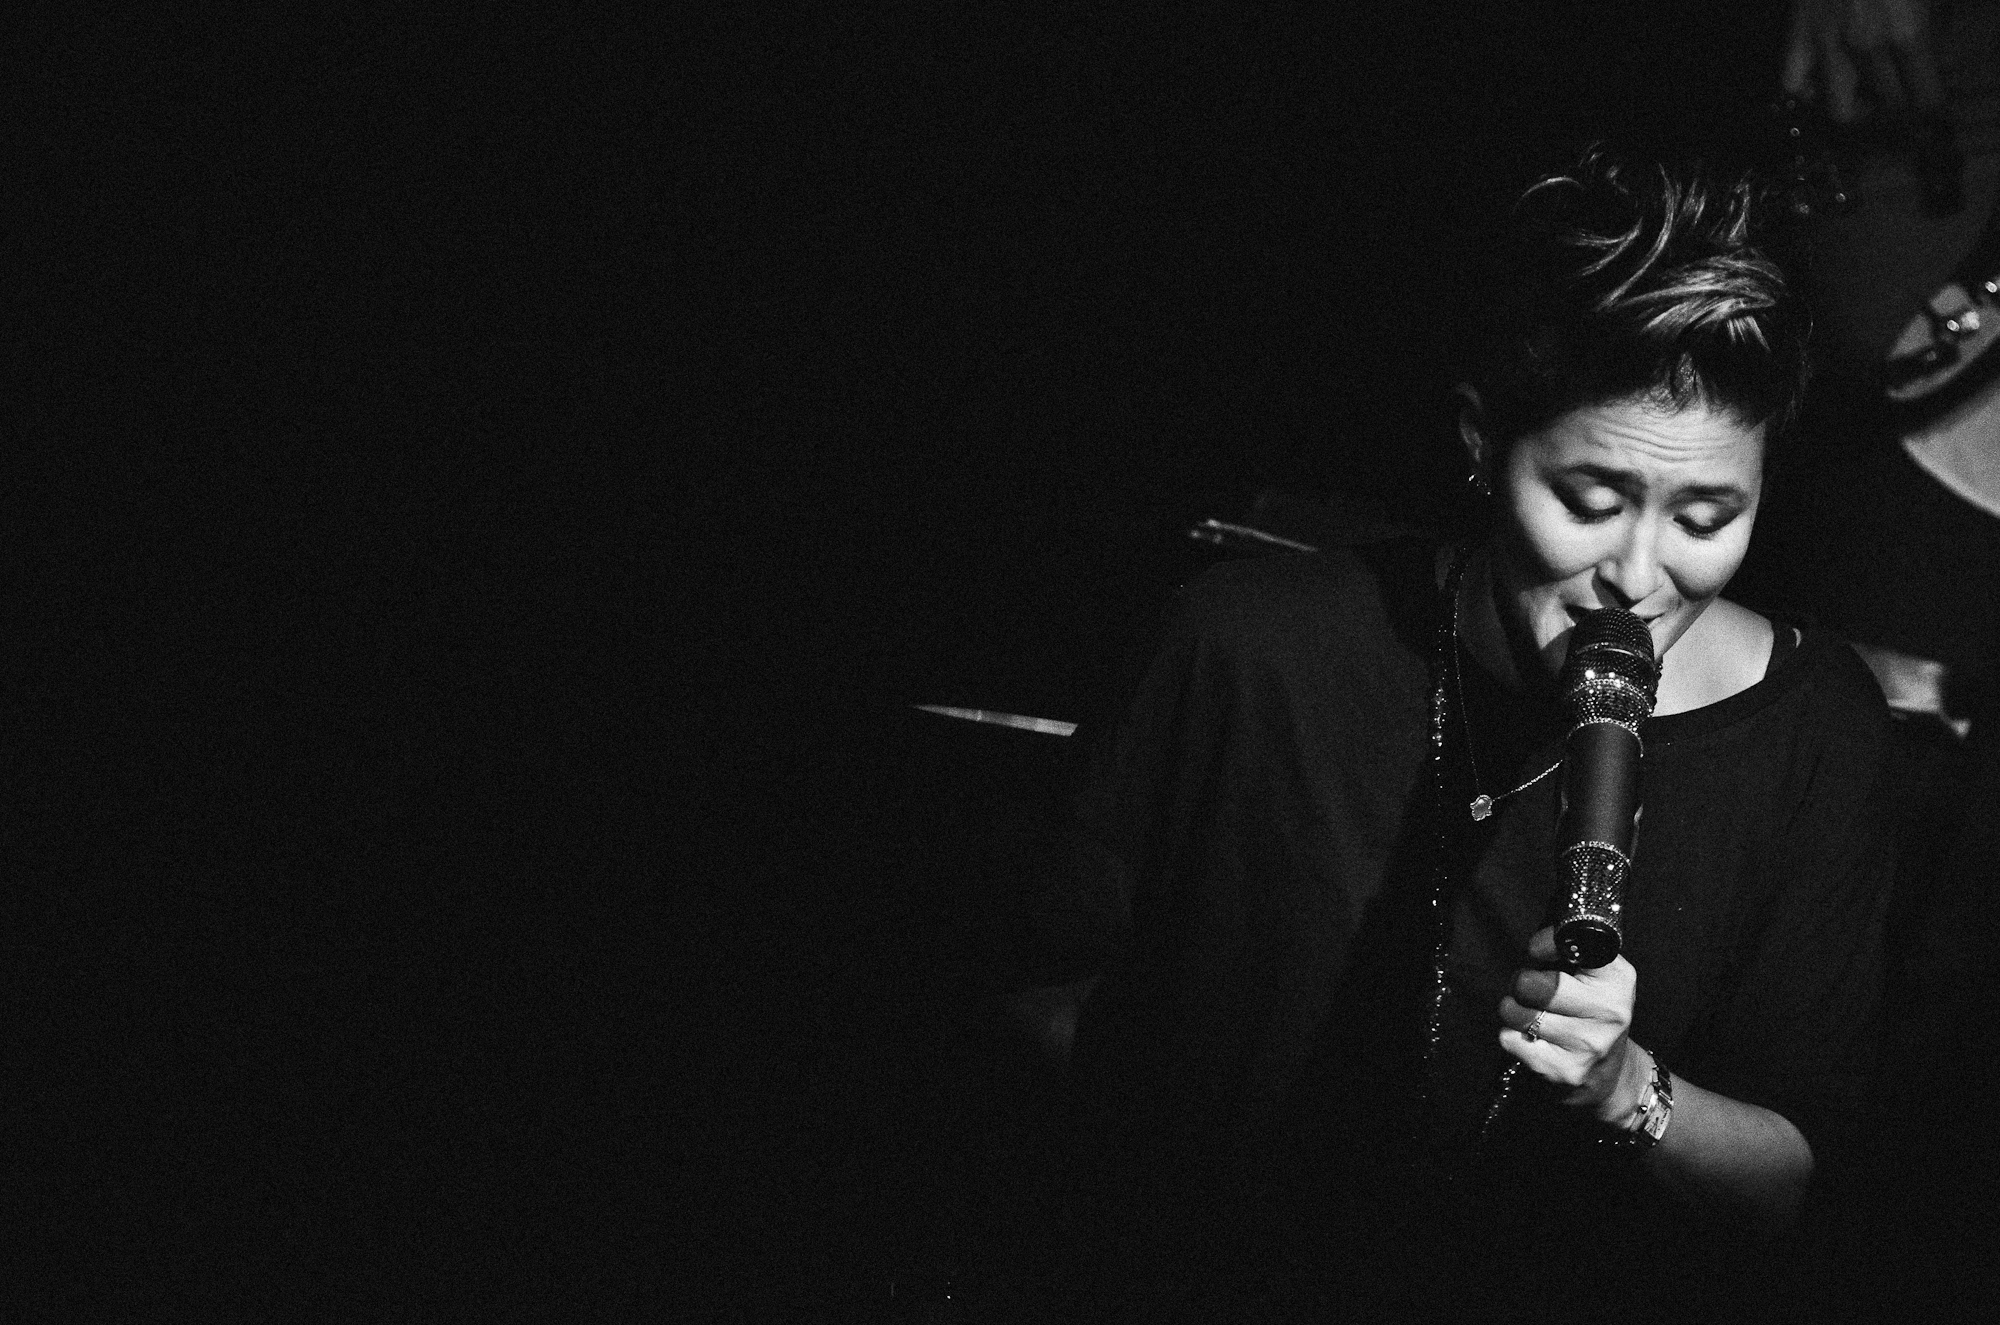 no-black-tie-jazz-club-kuala-lumpur-nbt-melissa-indot-sting-jan-2016-1206.jpg